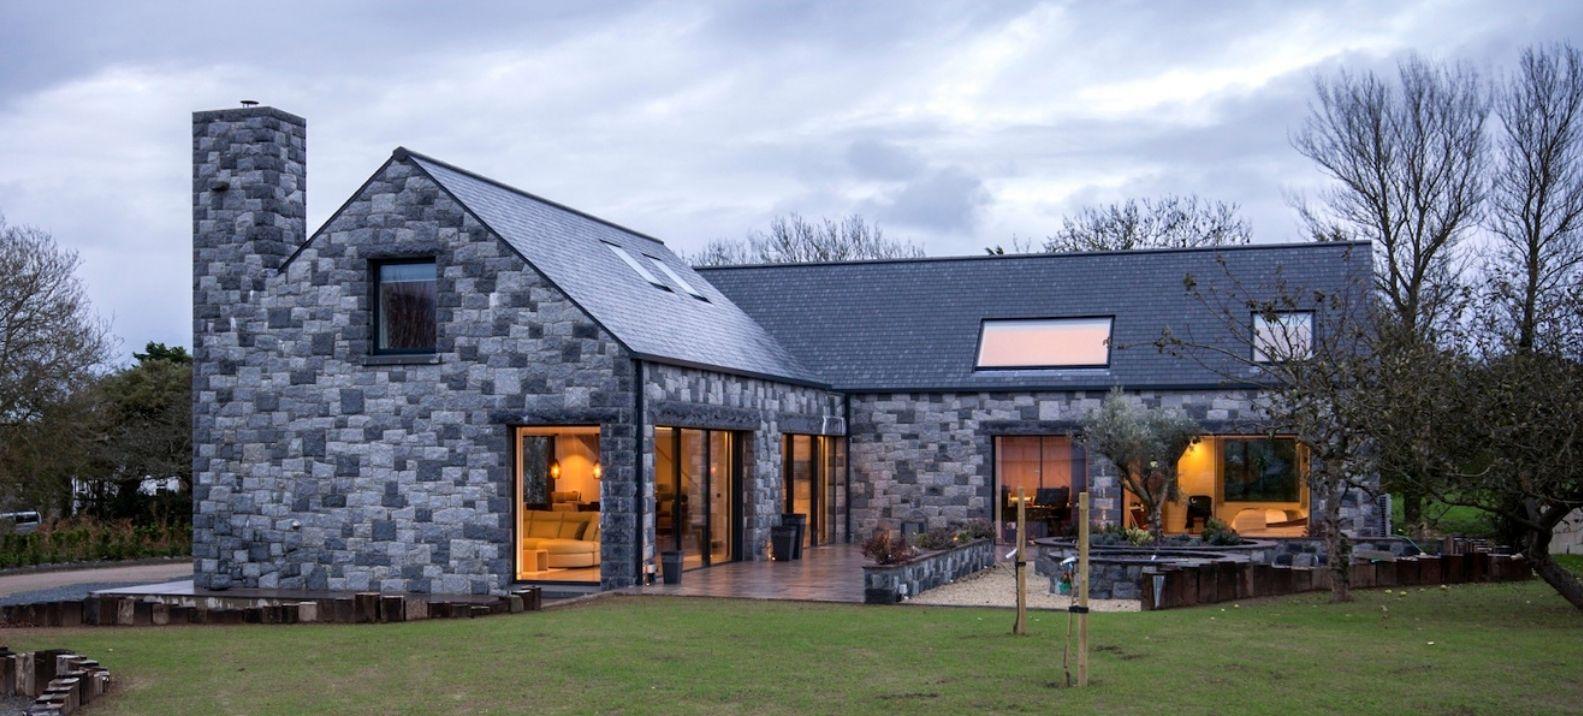 legacy conservation rooflights - flush rooflight system